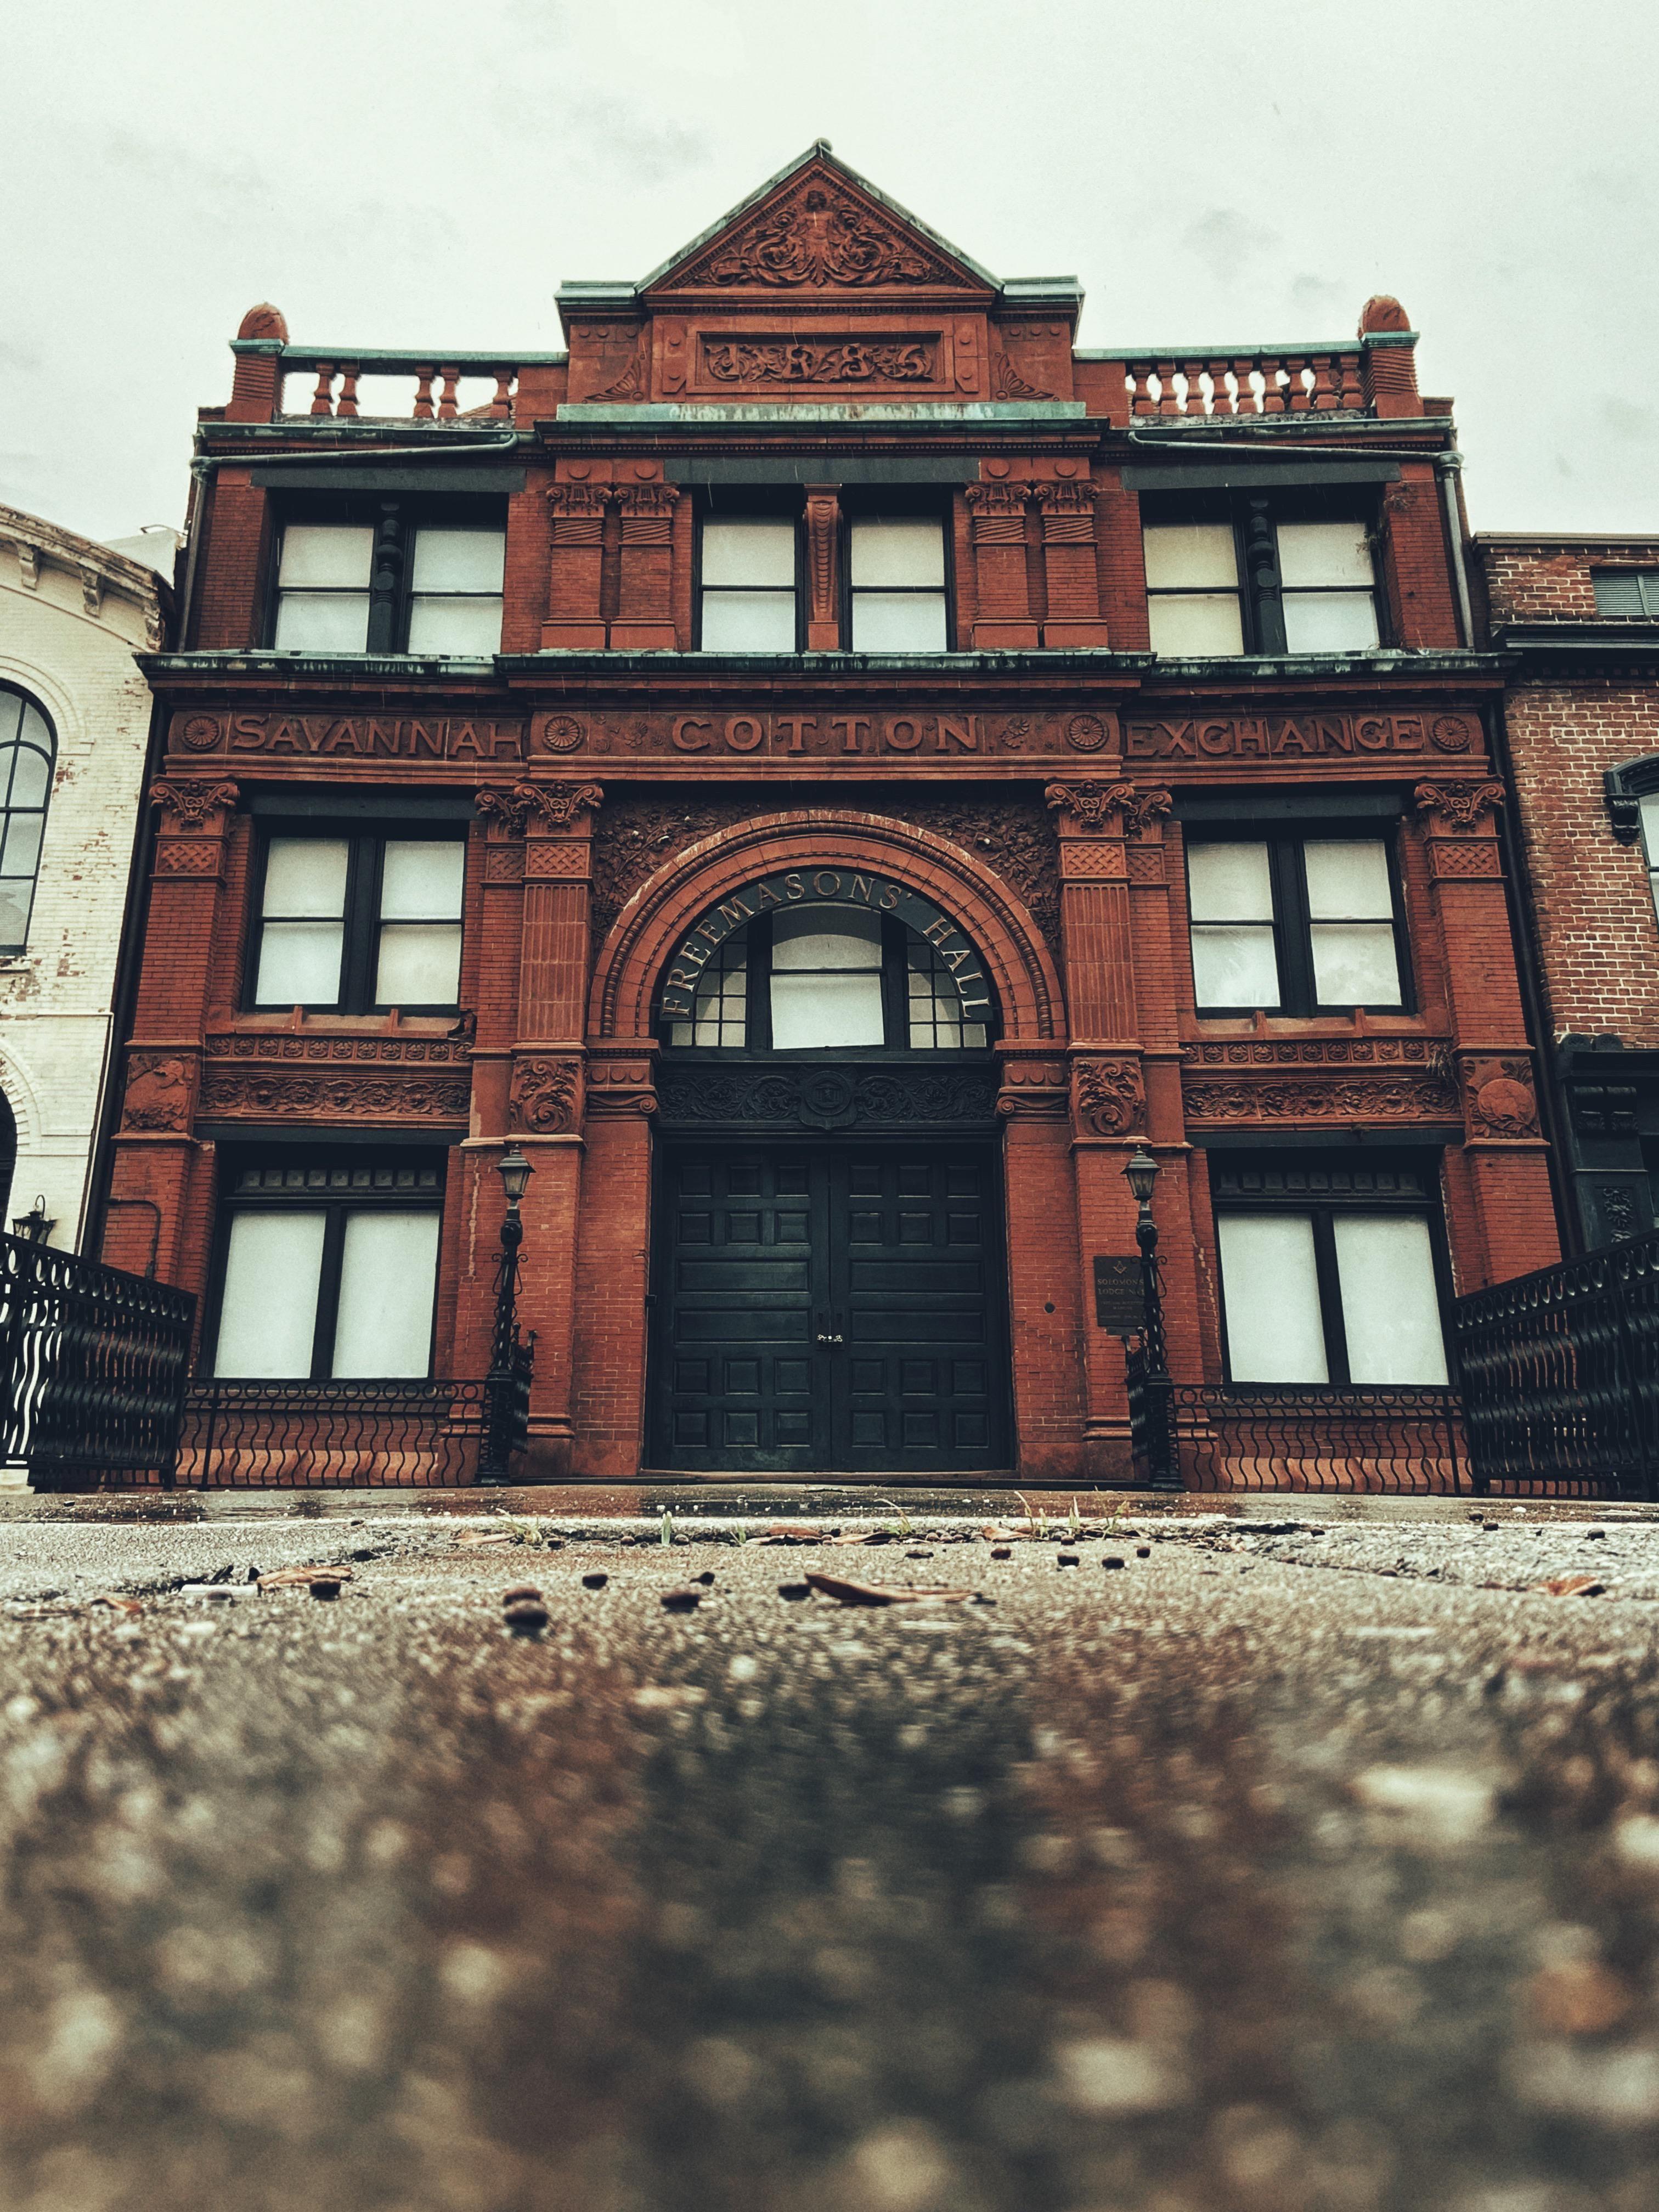 ITAP of a Building in Savannah Georgia#PHOTO #CAPTURE #NATURE #INCREDIBLE